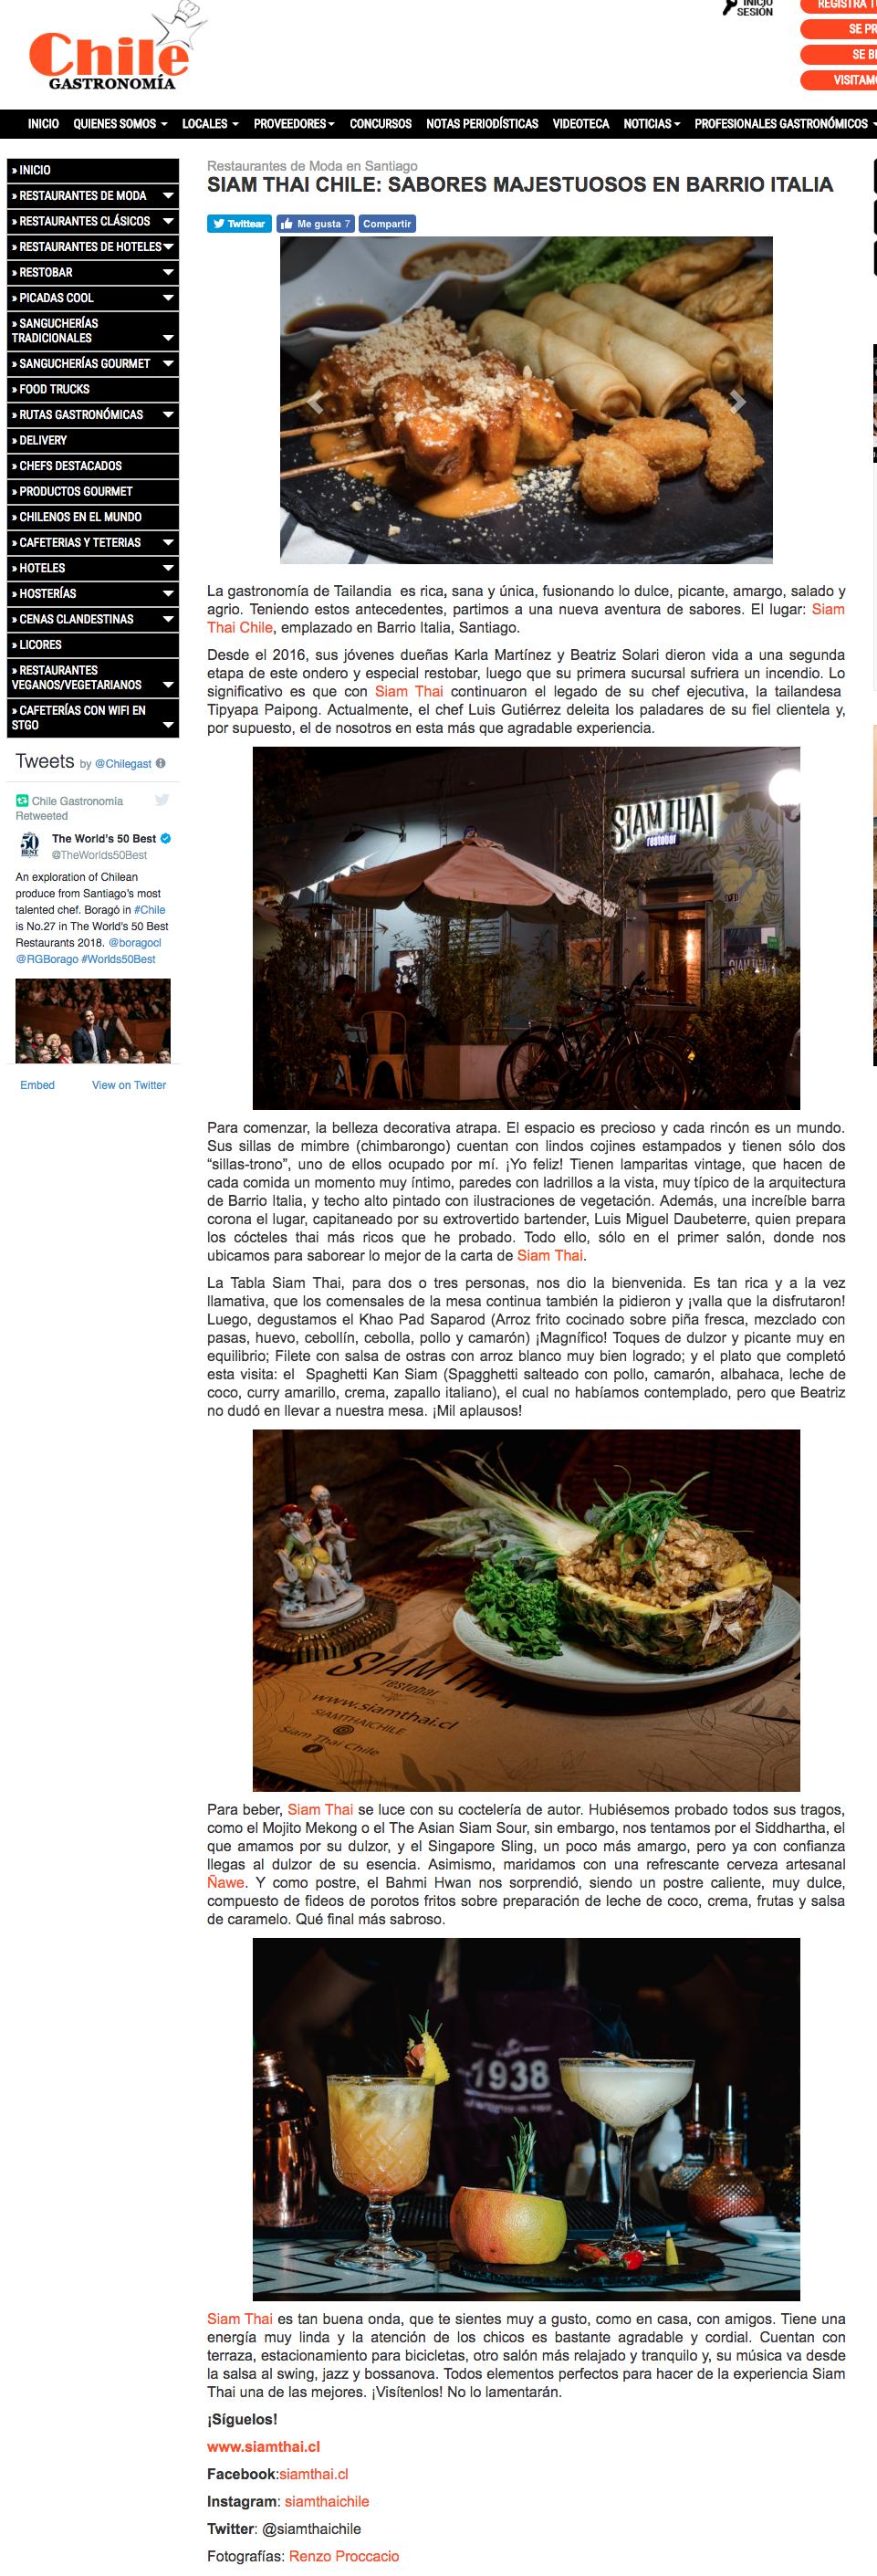 FireShot_Capture_41_-_Chile_Gastronomía__-_http___chilegastronomia.cl_restaur